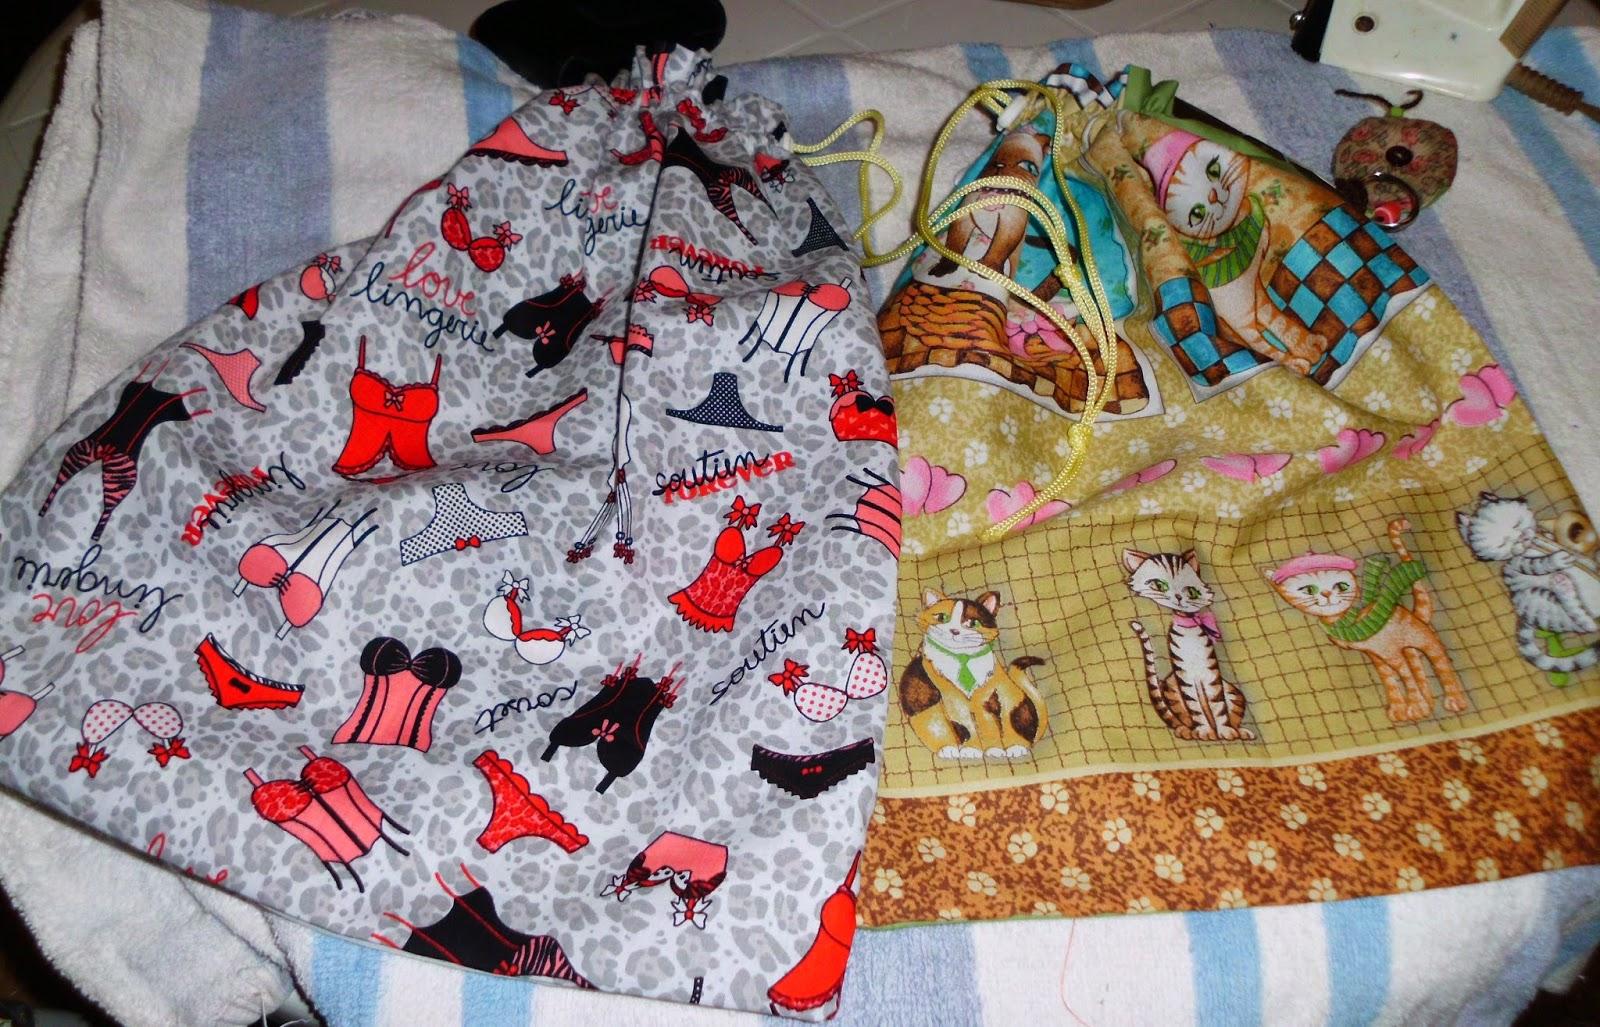 abuela creativa bolsitas para la ropa interior